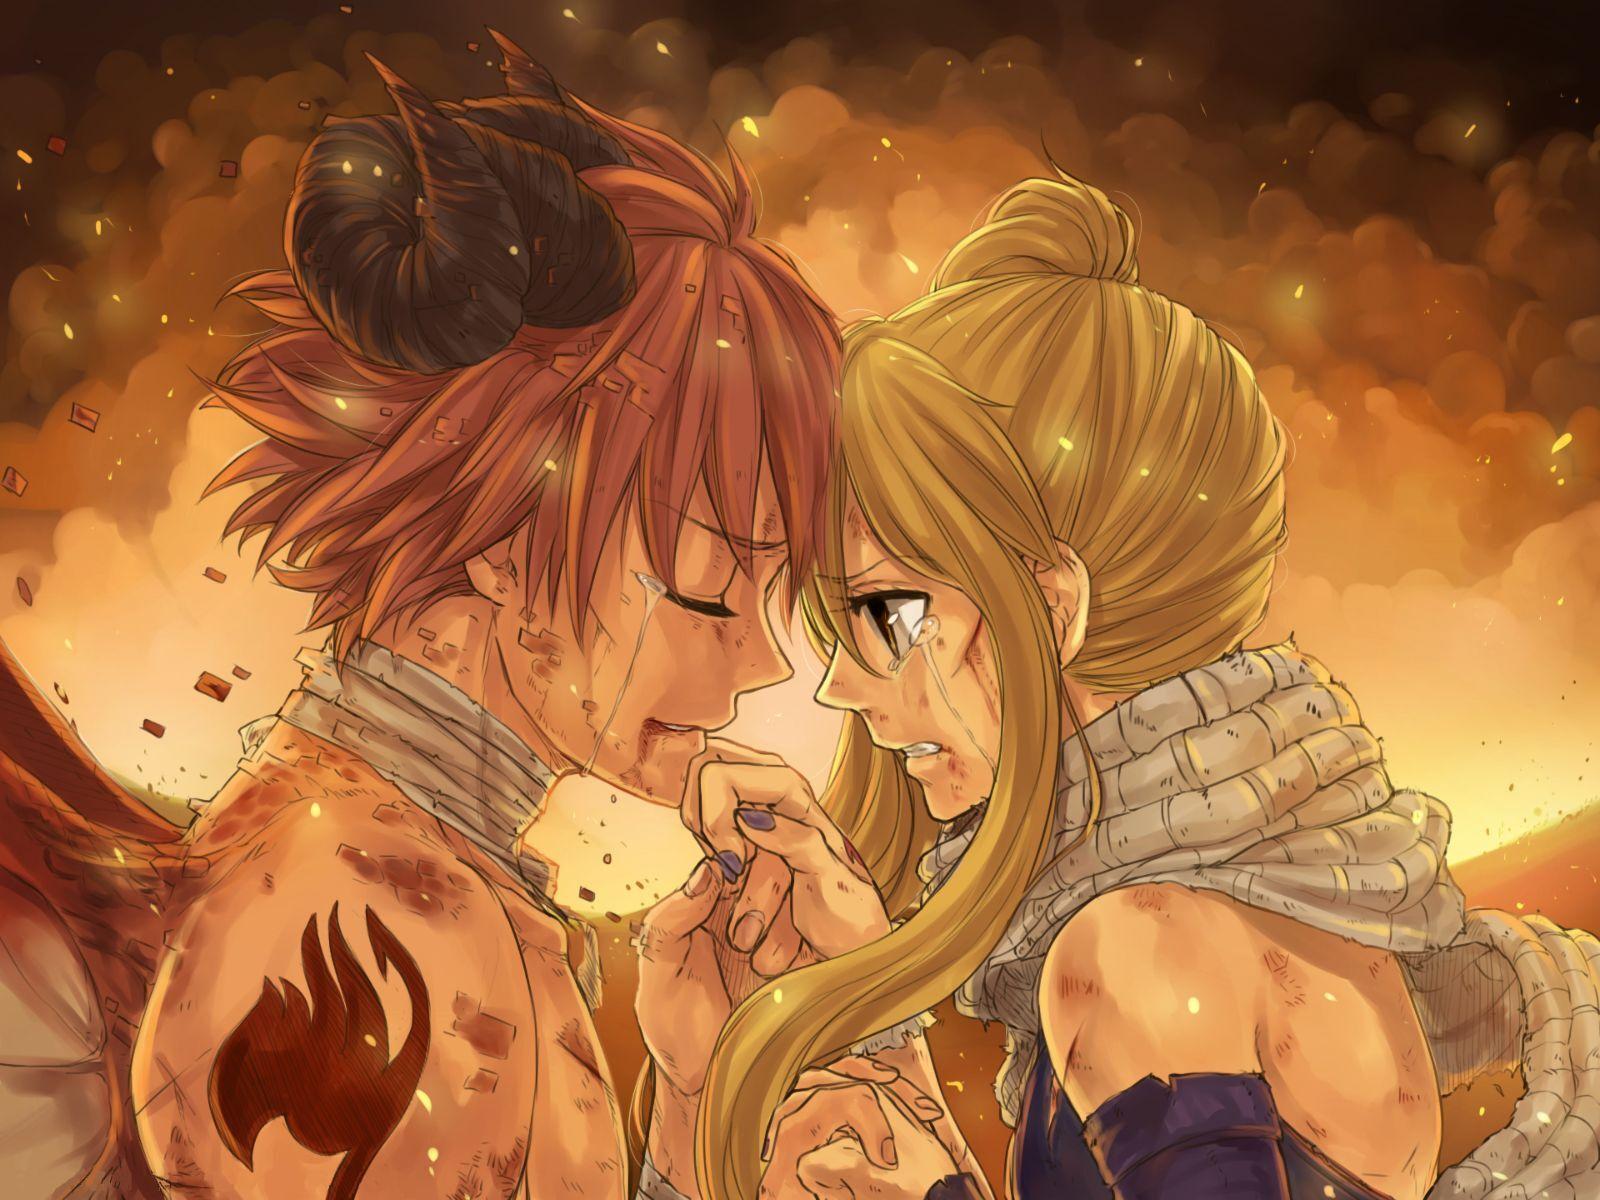 Poster A3 Fairy Tail Lucy Heartfilia Manga Anime Cartel Decor Impresion 01